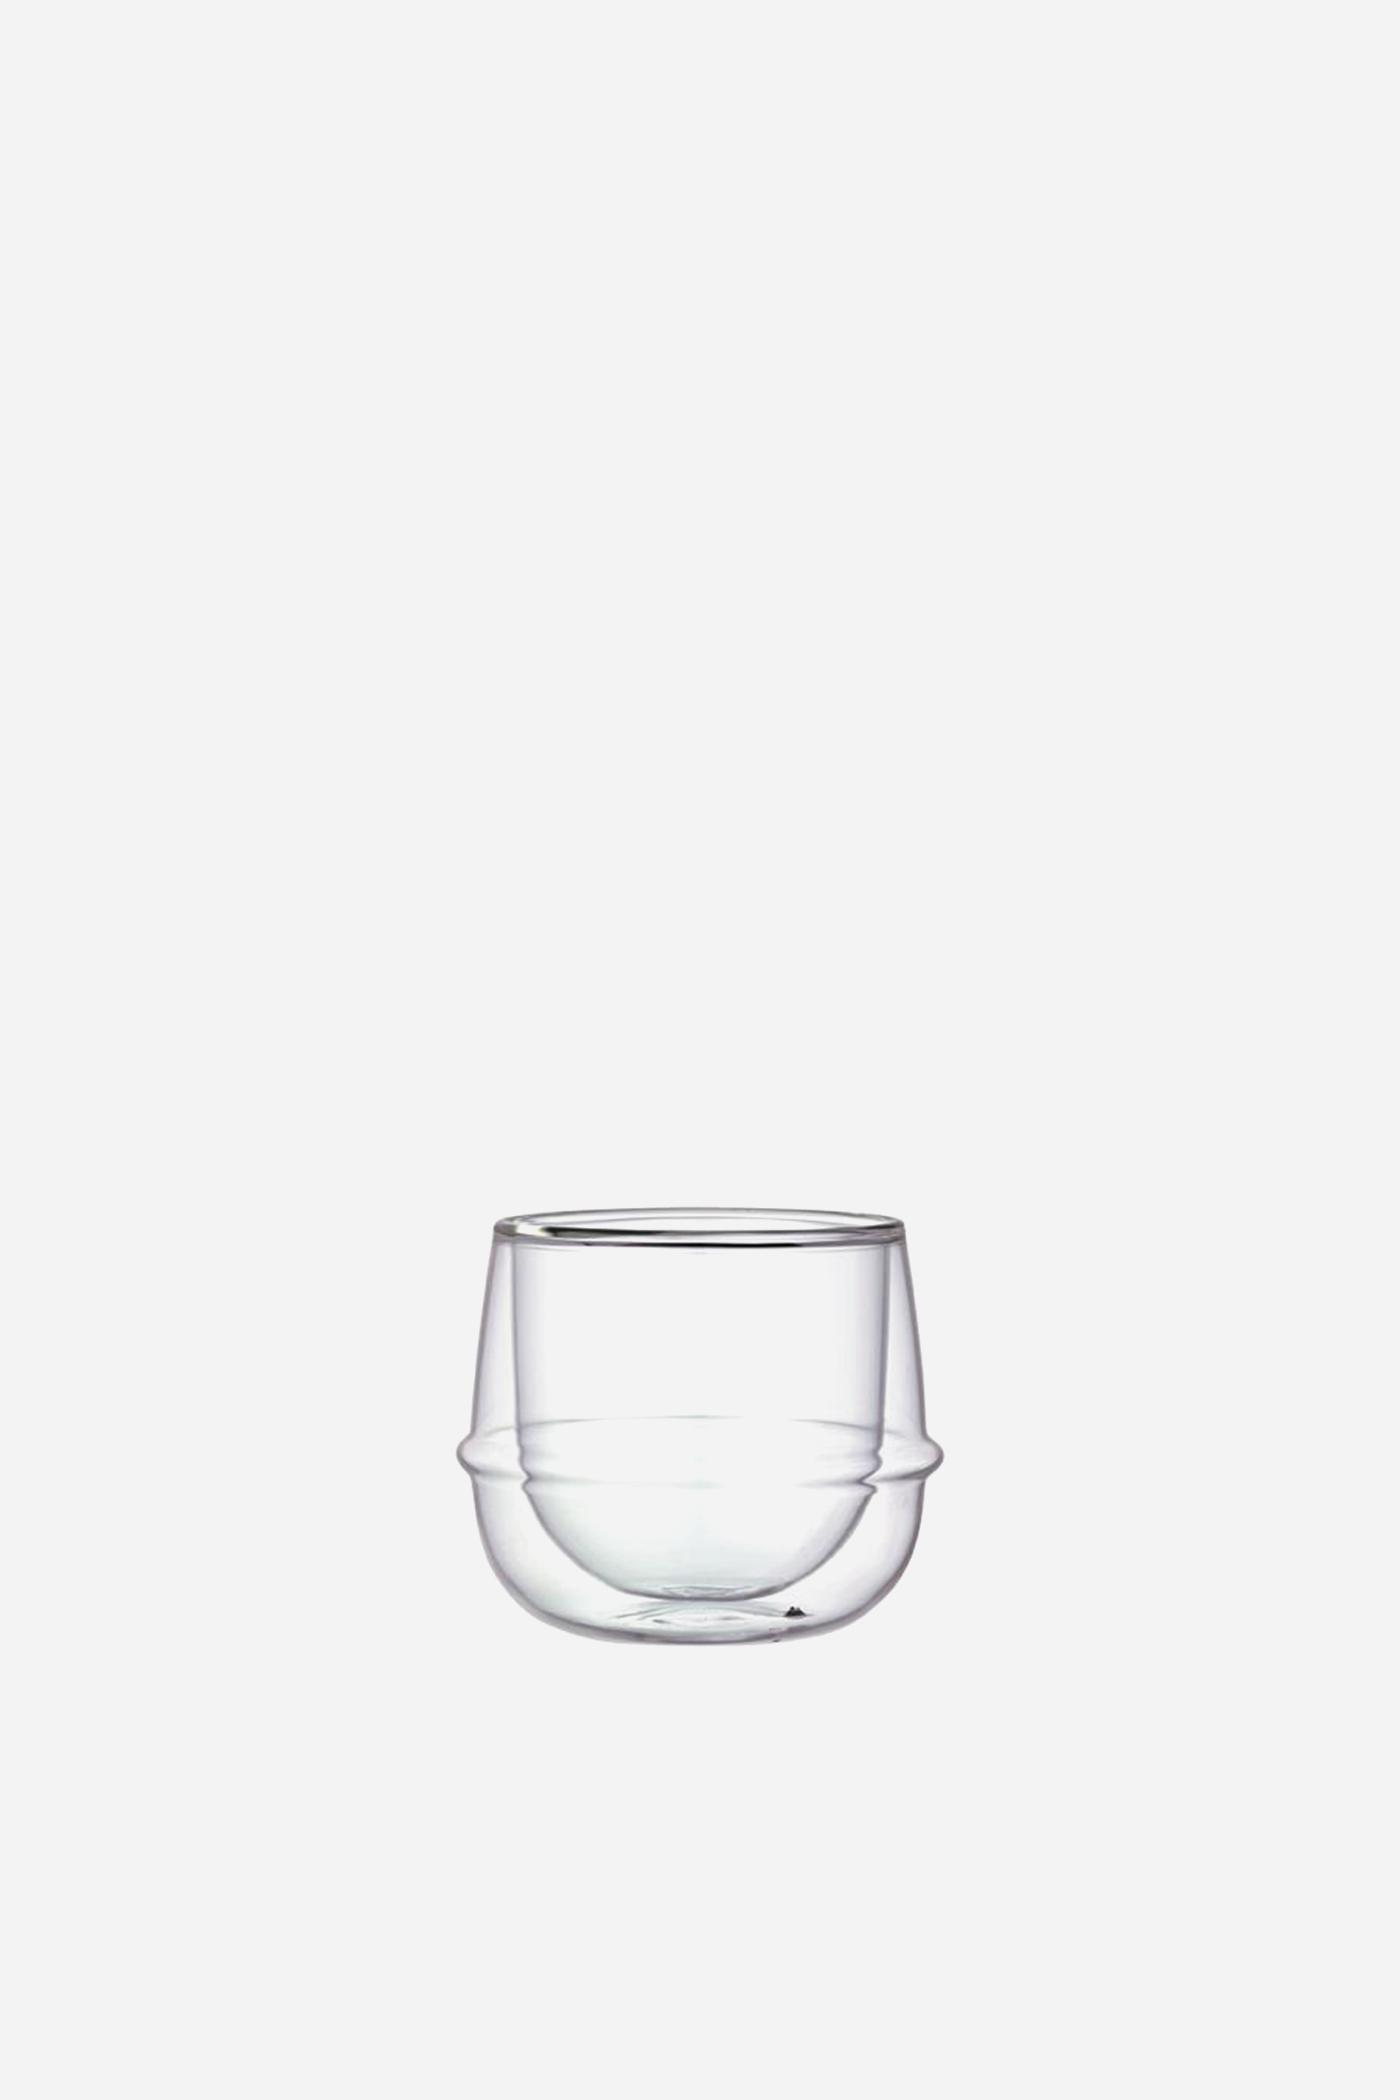 Kinto Kronos Double Wall Wine Glass